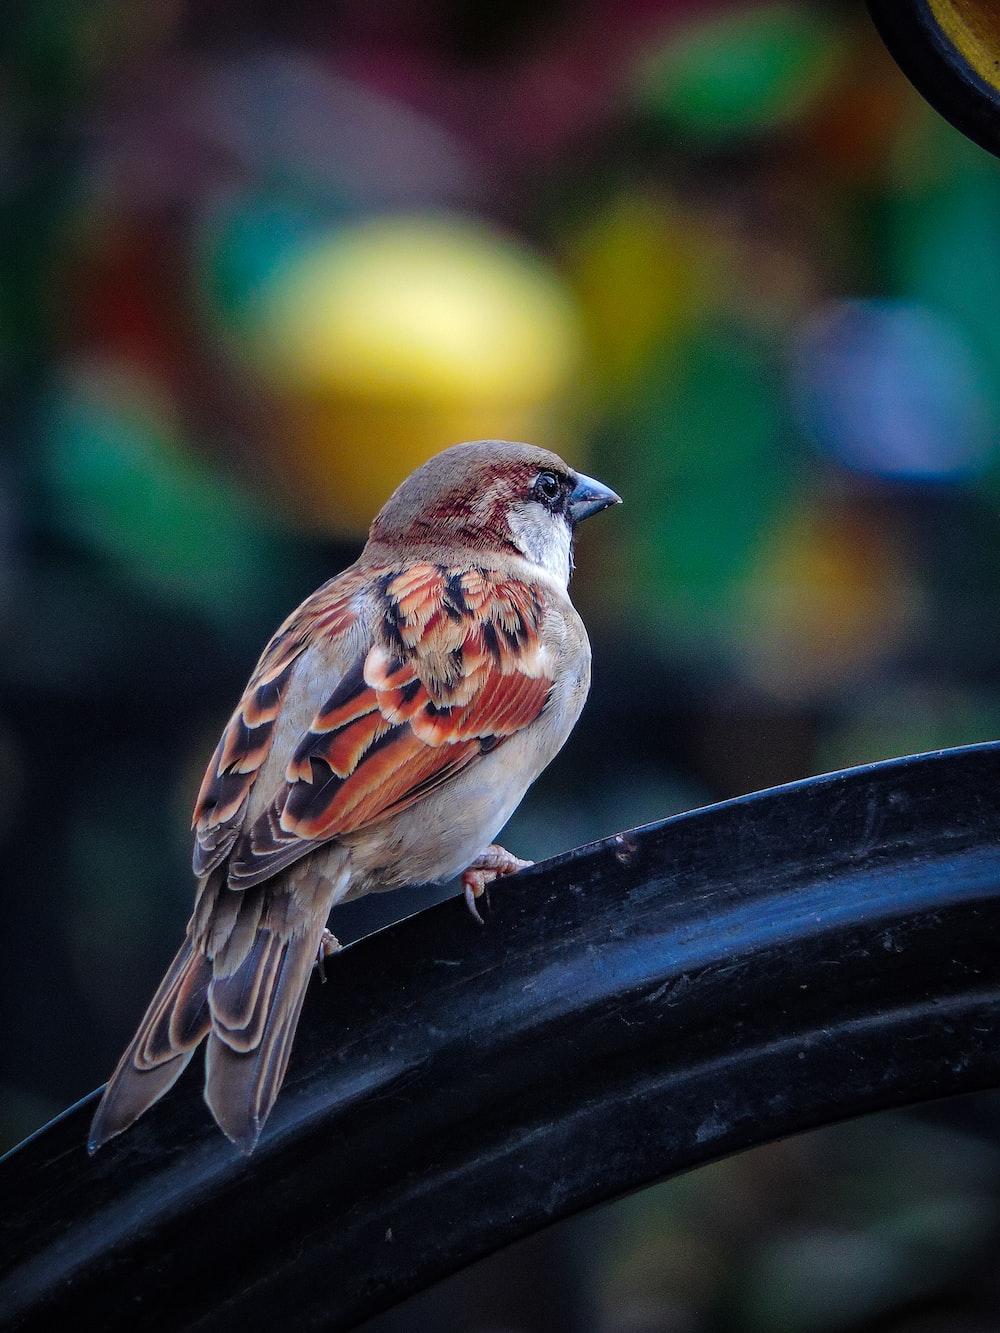 sparrow on black surface